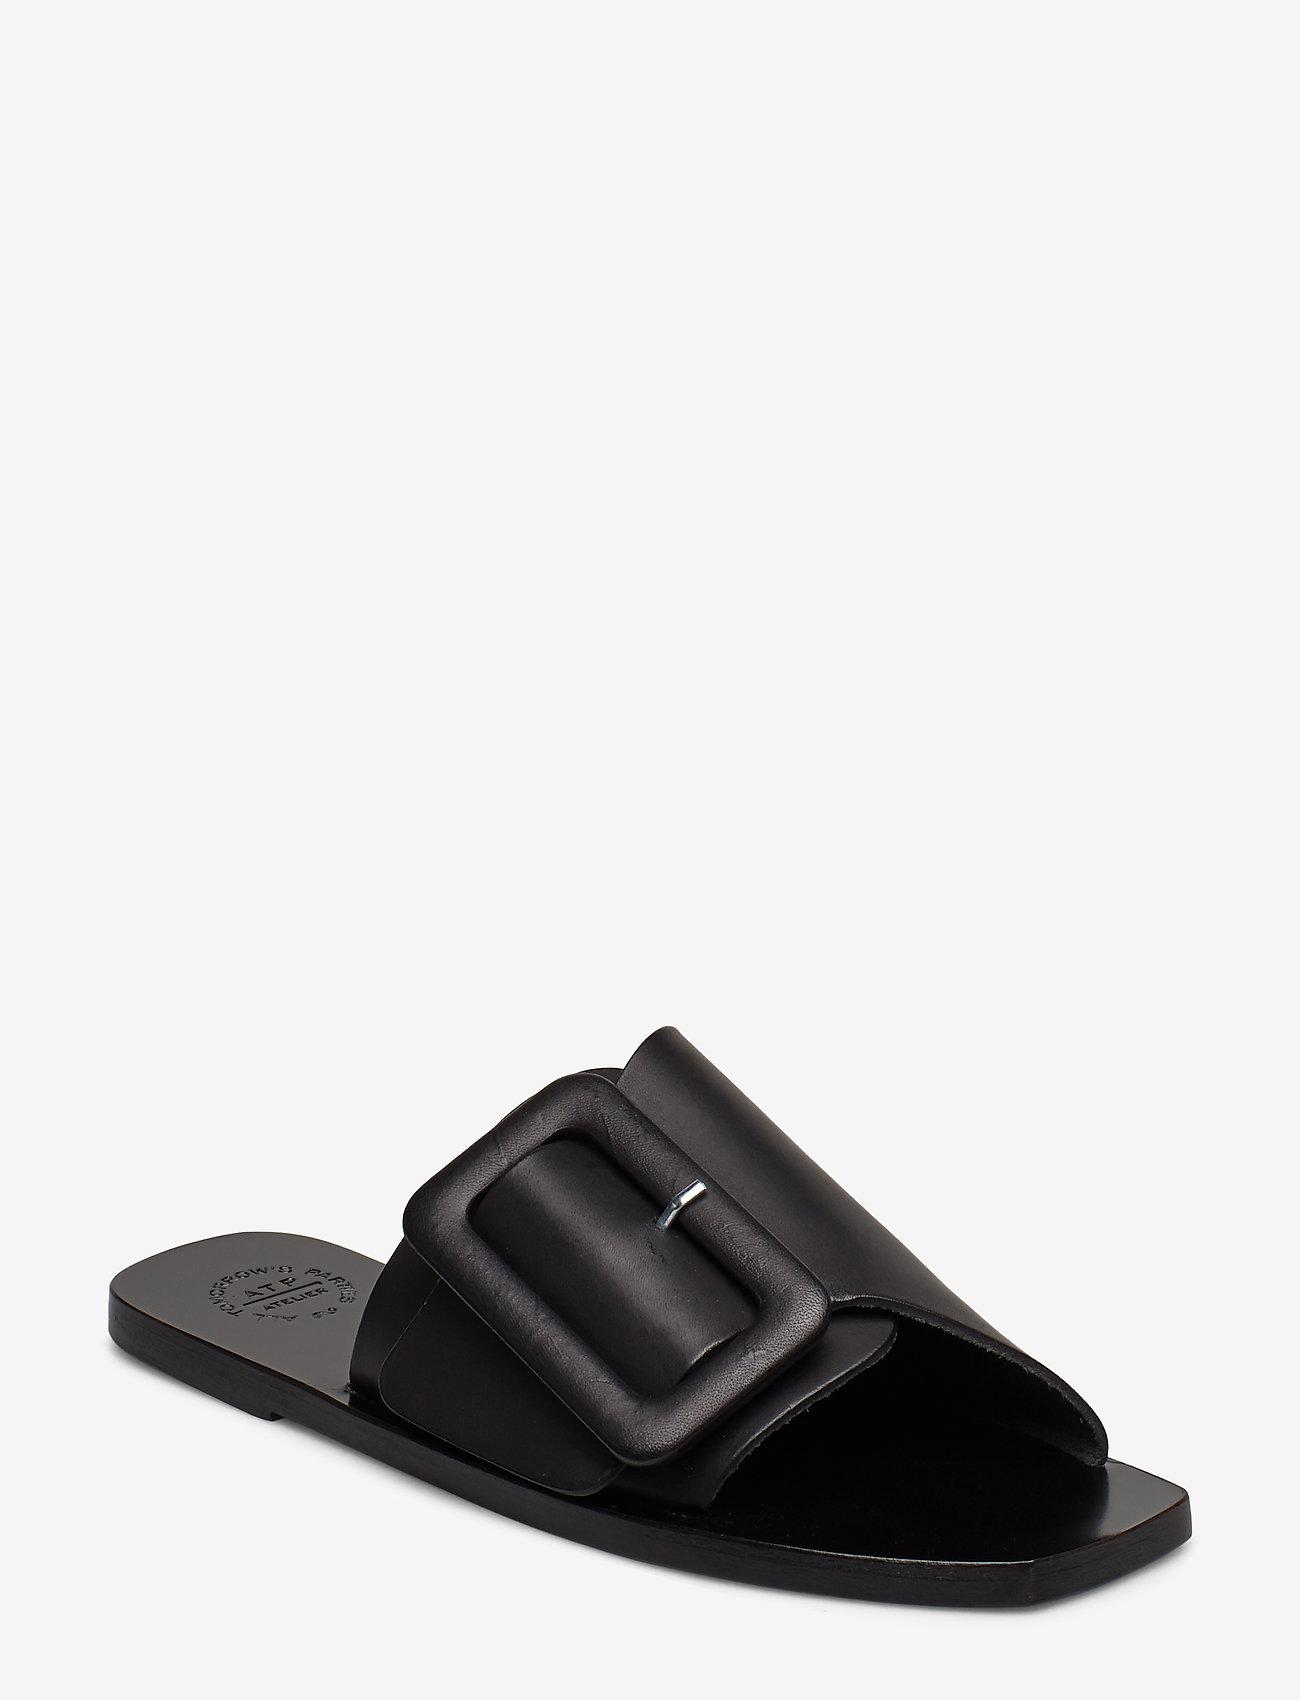 ATP Atelier - Ceci Black Vacchetta - płaskie sandały - black - 0